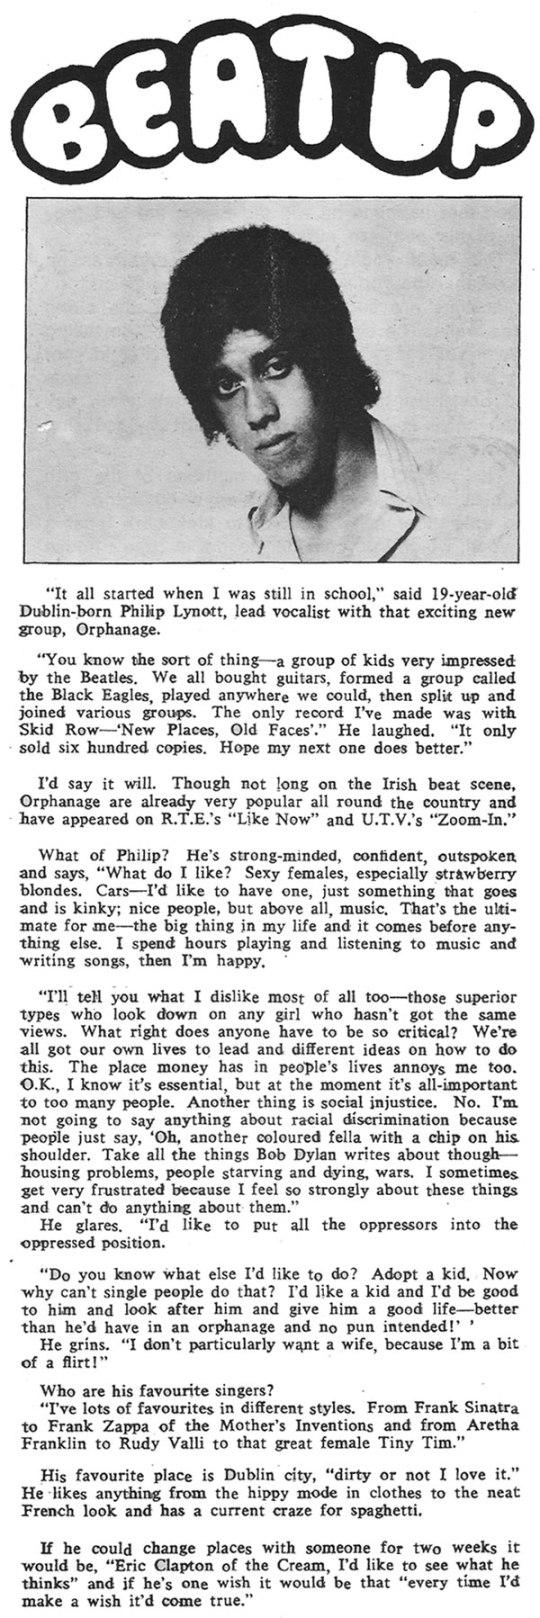 phil-lynott-interview-1969